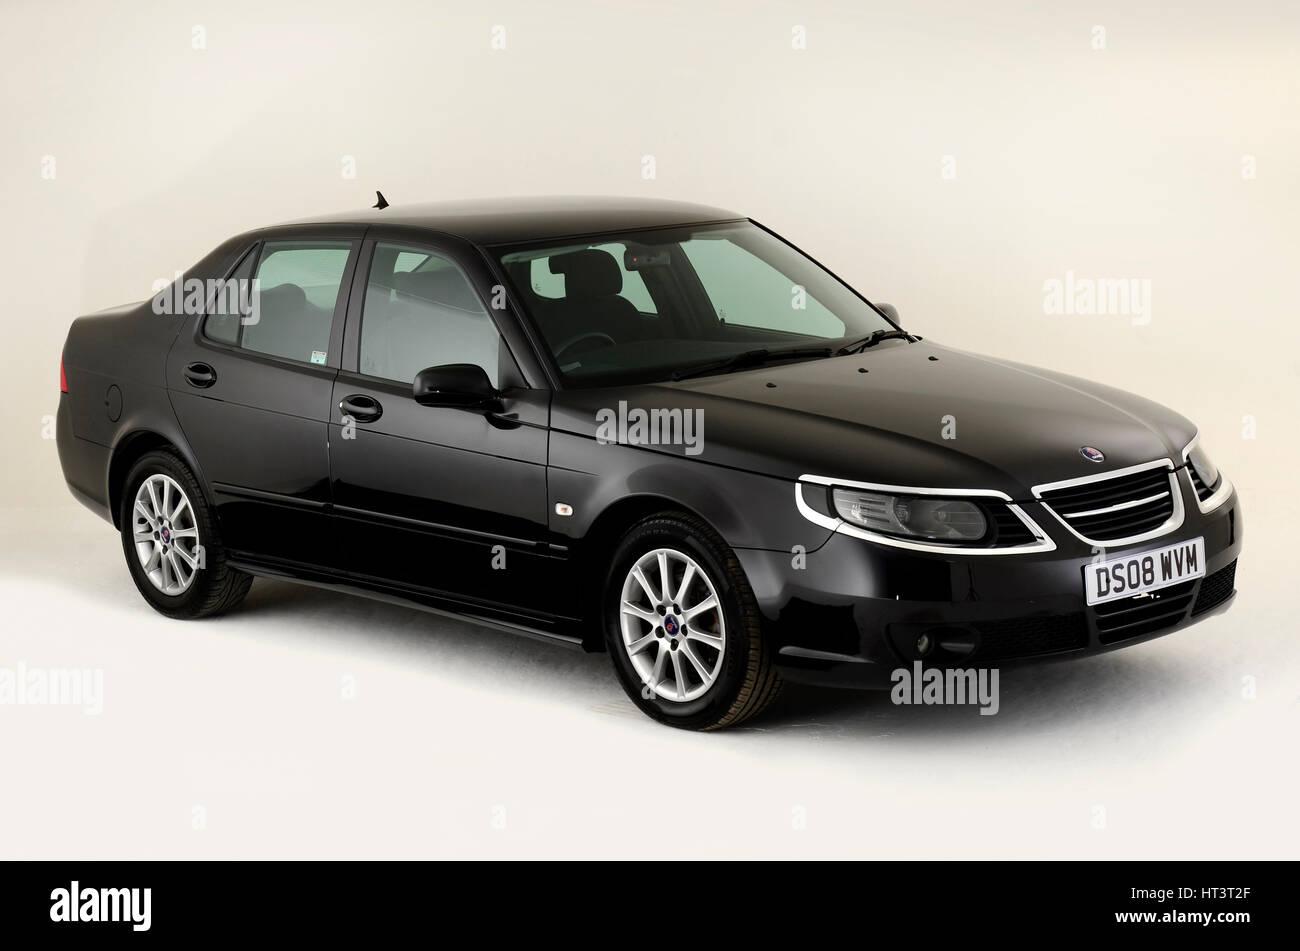 2008 Saab 95 Artist: Unknown. - Stock Image